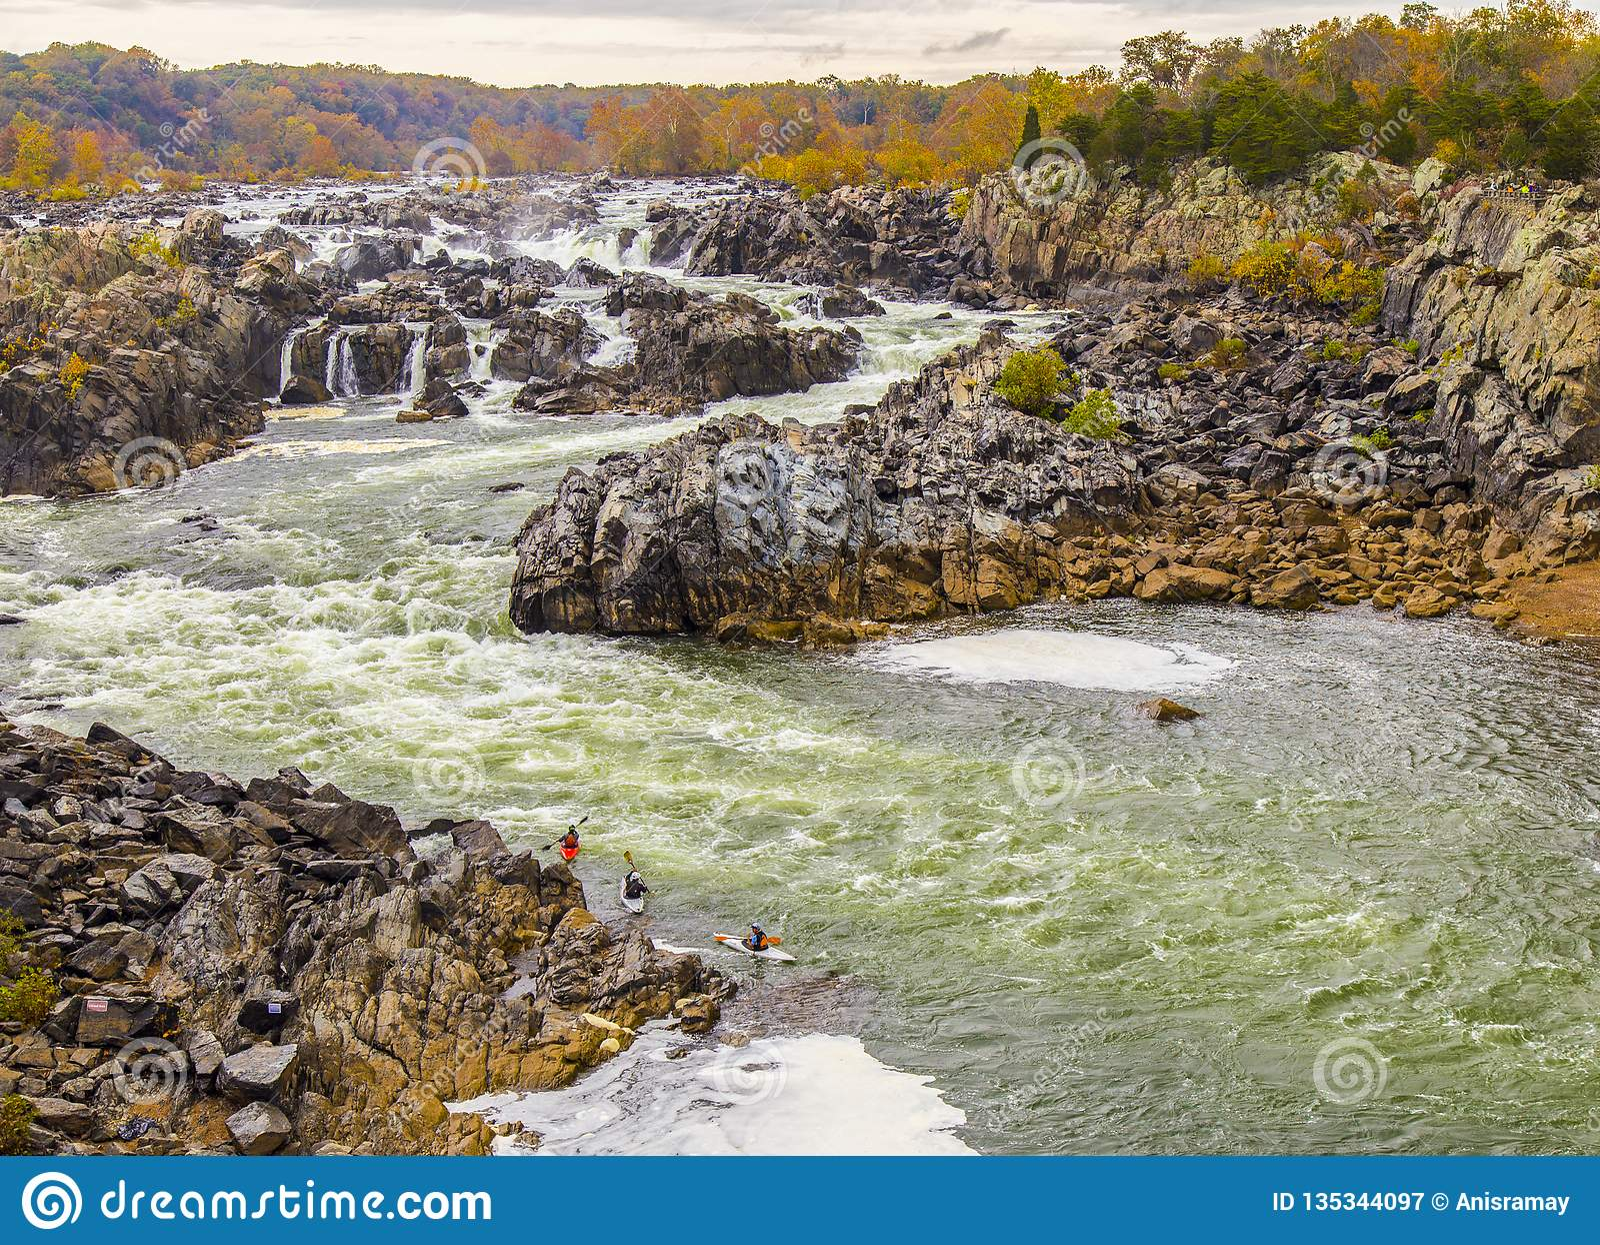 Sete quedas parque estadual, Washington DC, Virgínia, VA